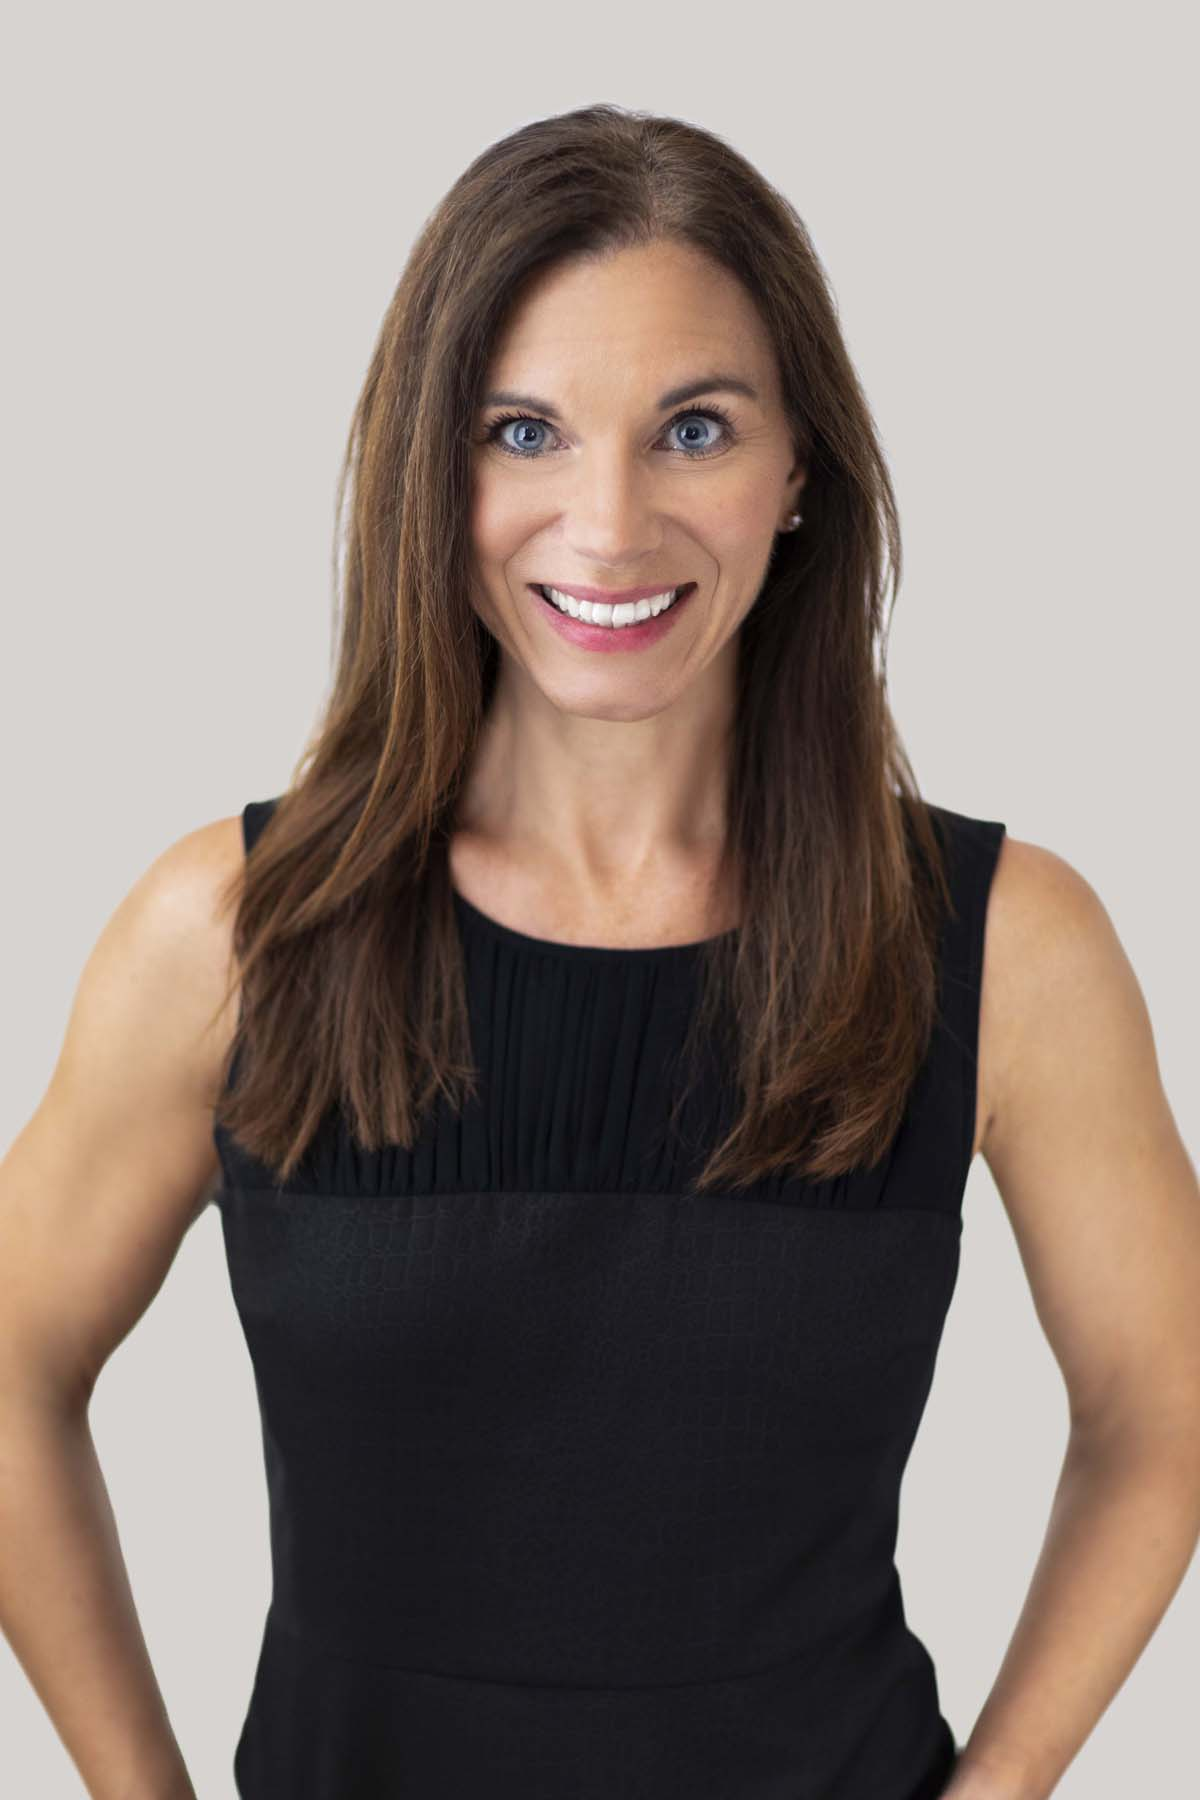 Nicole Fallowfield